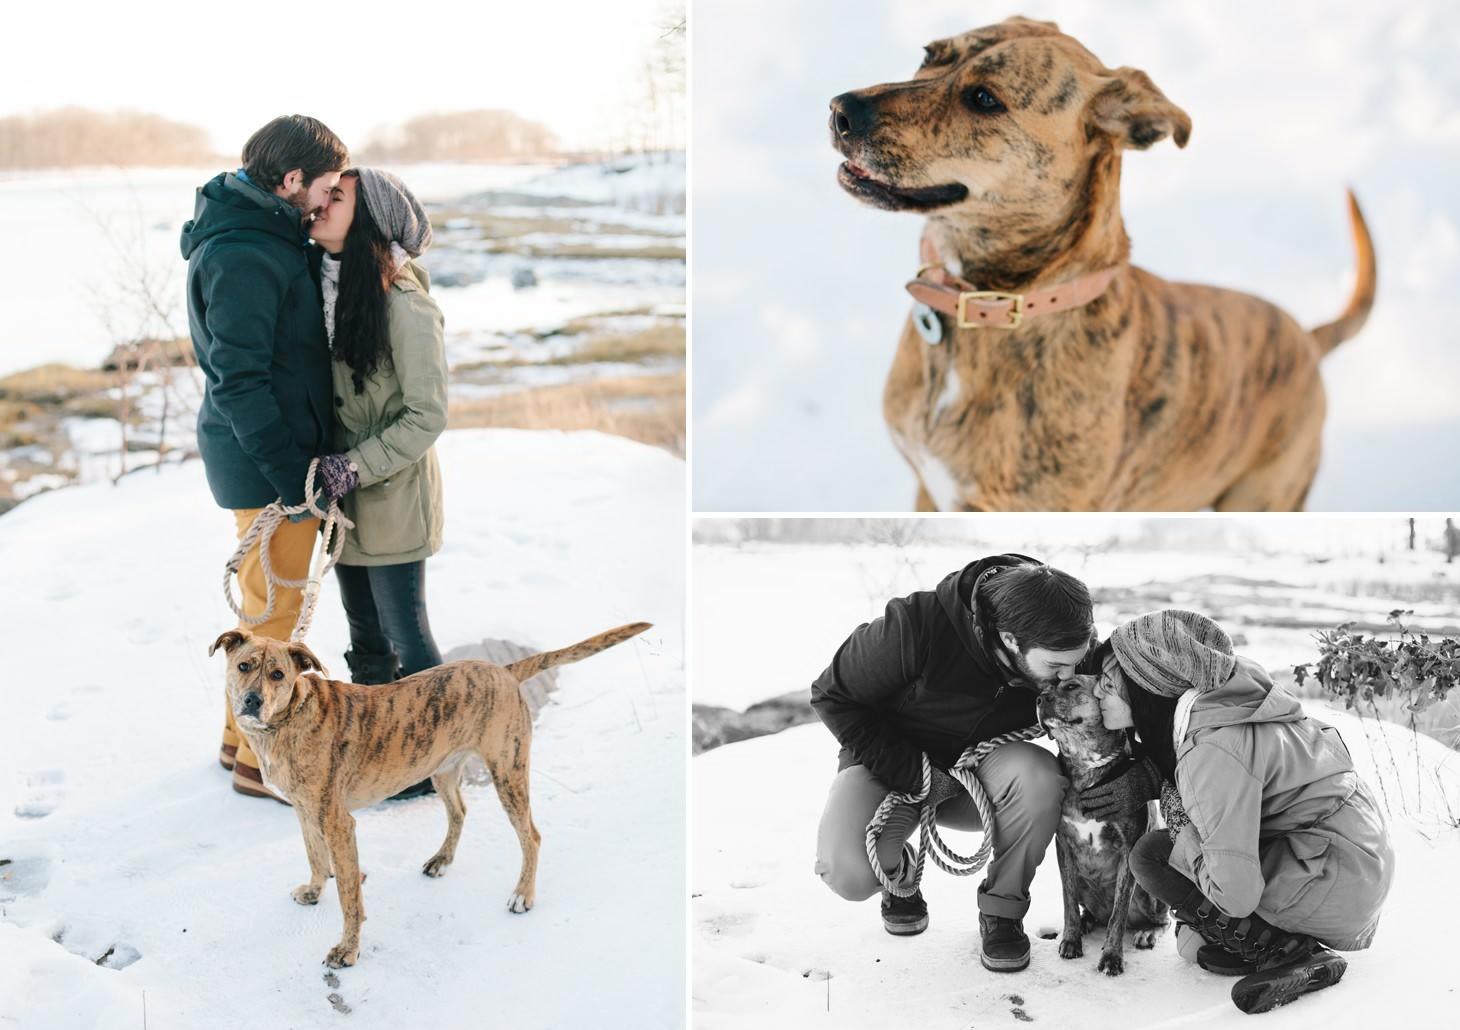 039-nyc-wedding-photographer-orchard-beach-bronx-engagement-winter-smitten-chickens.jpg